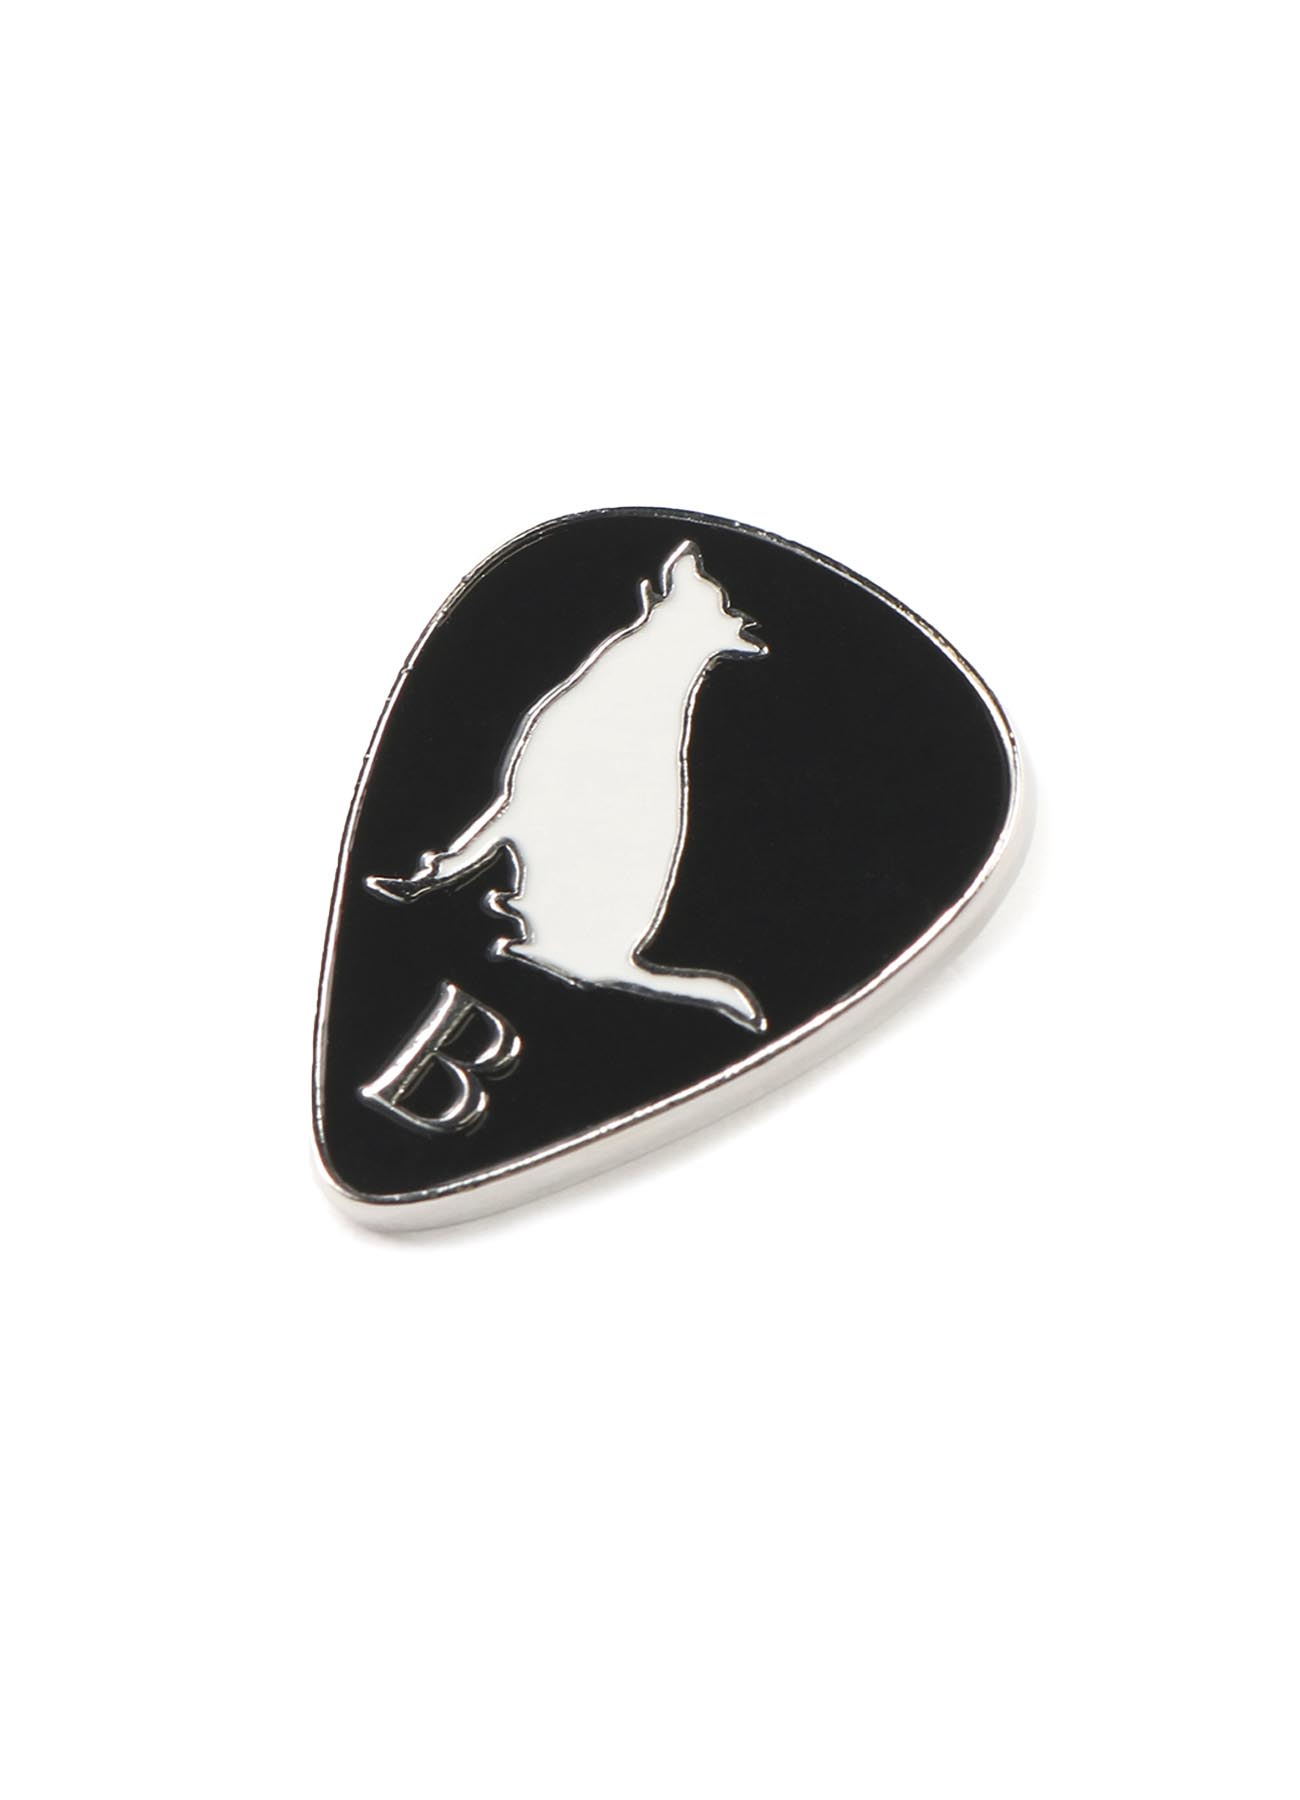 B Yohji Yamamoto Guitar pick Pin badge